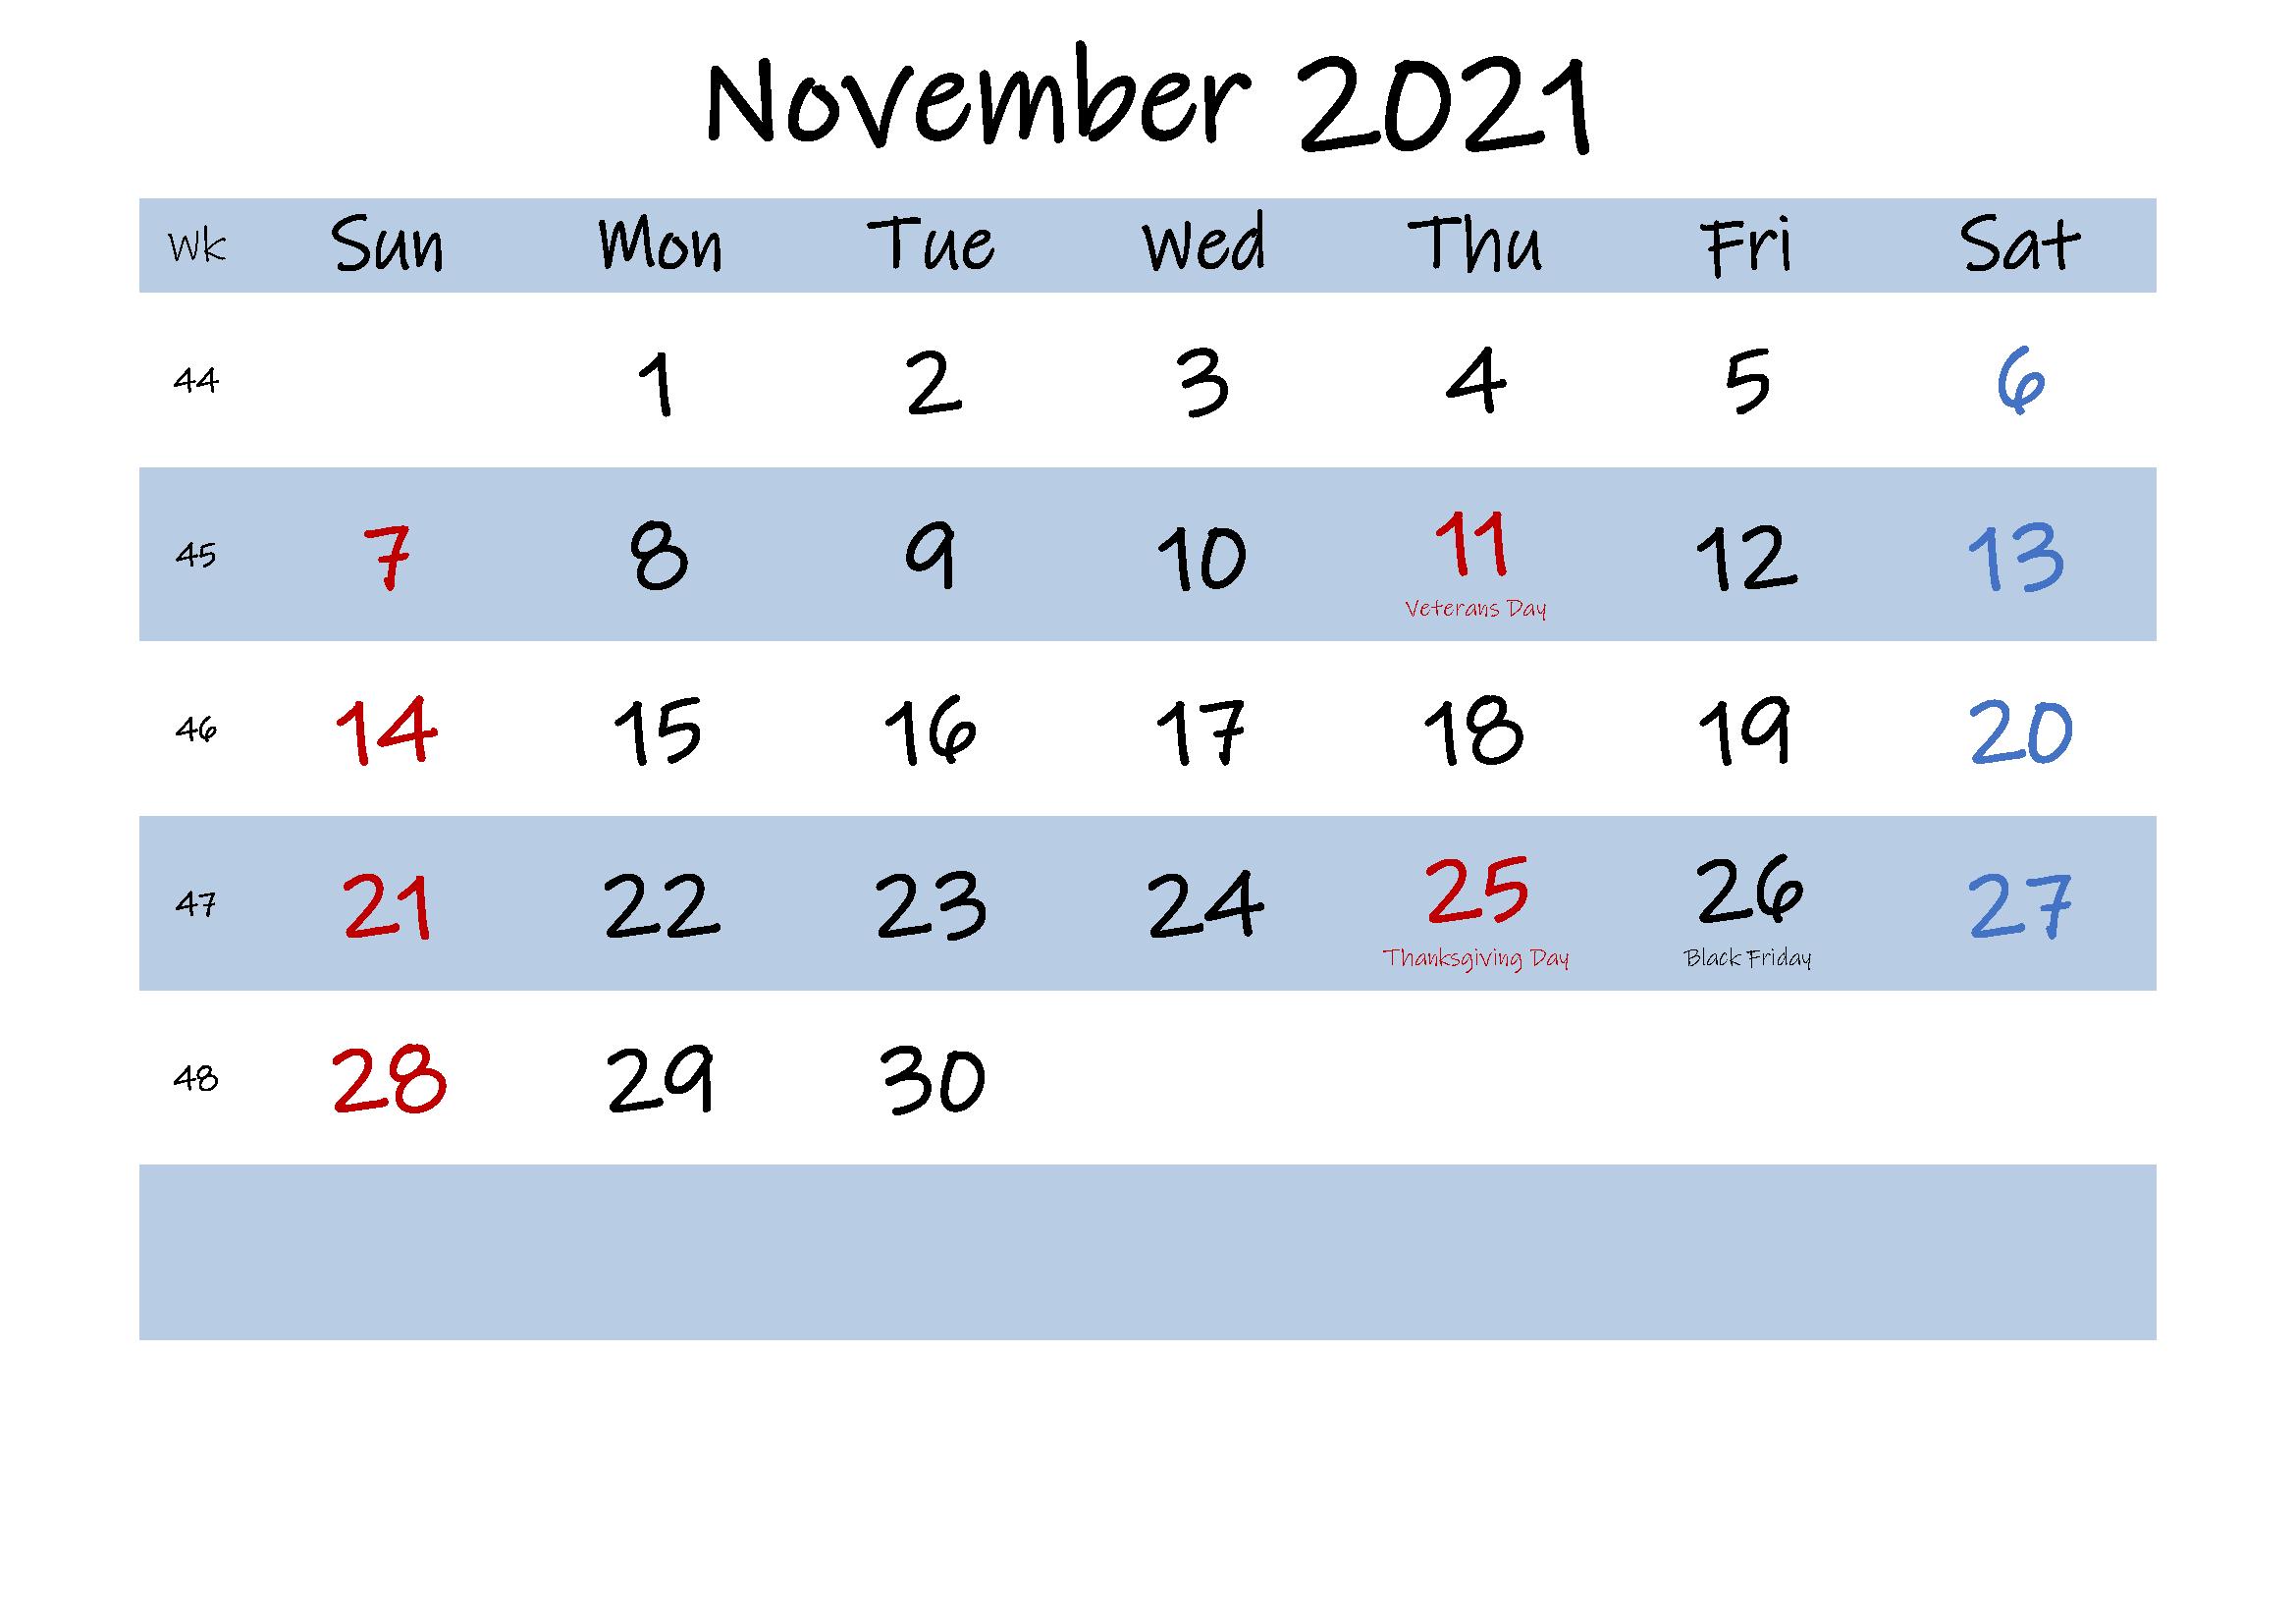 November 2021 Printable Calendar Coloring Pages